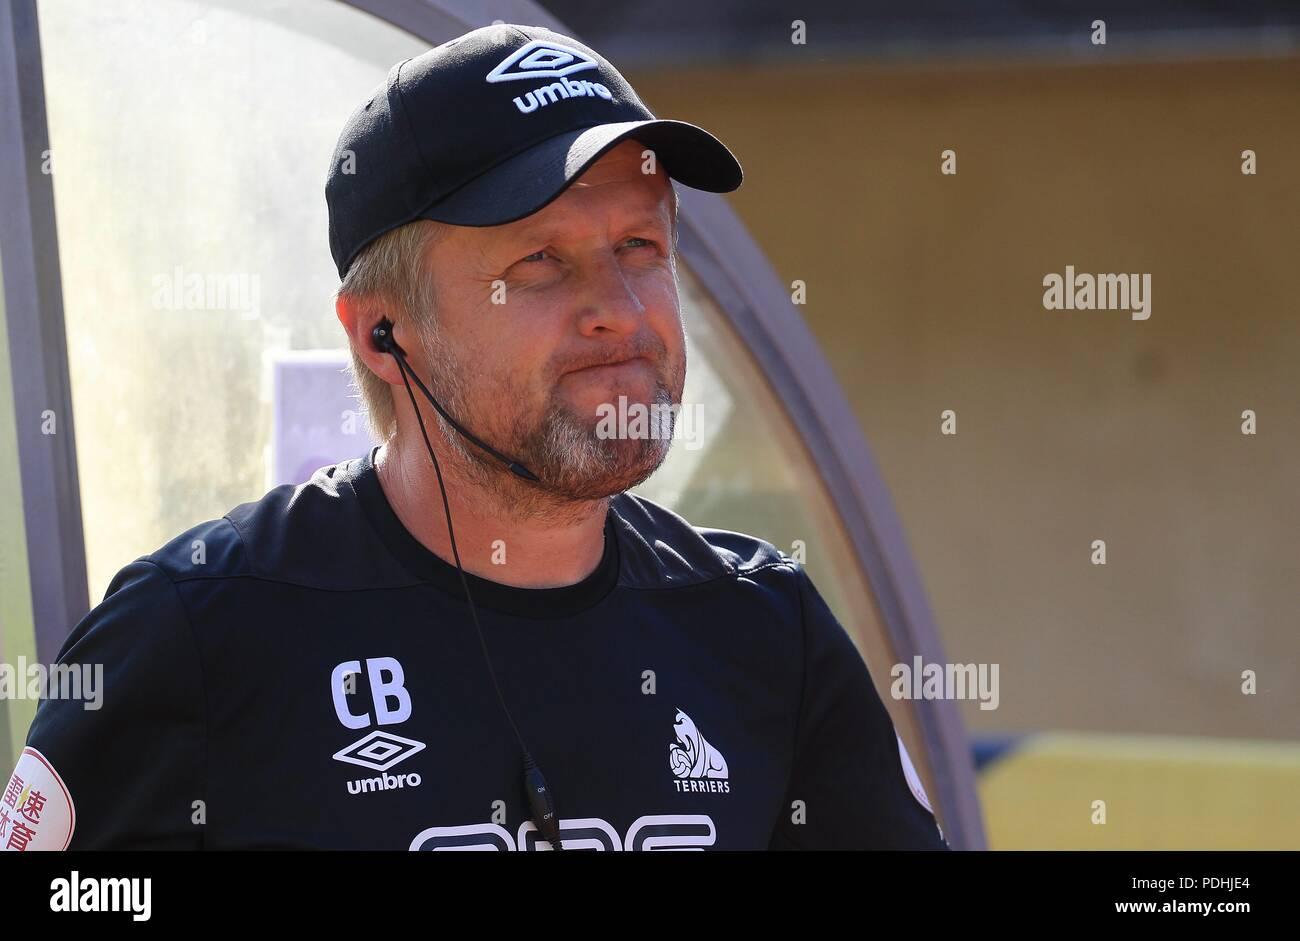 firo Football, 03.08.2018 1st Bundesliga, season 2018/2019 Test match RB Red Bull Leipzig - Huddersfield Co coach   - Stock Image